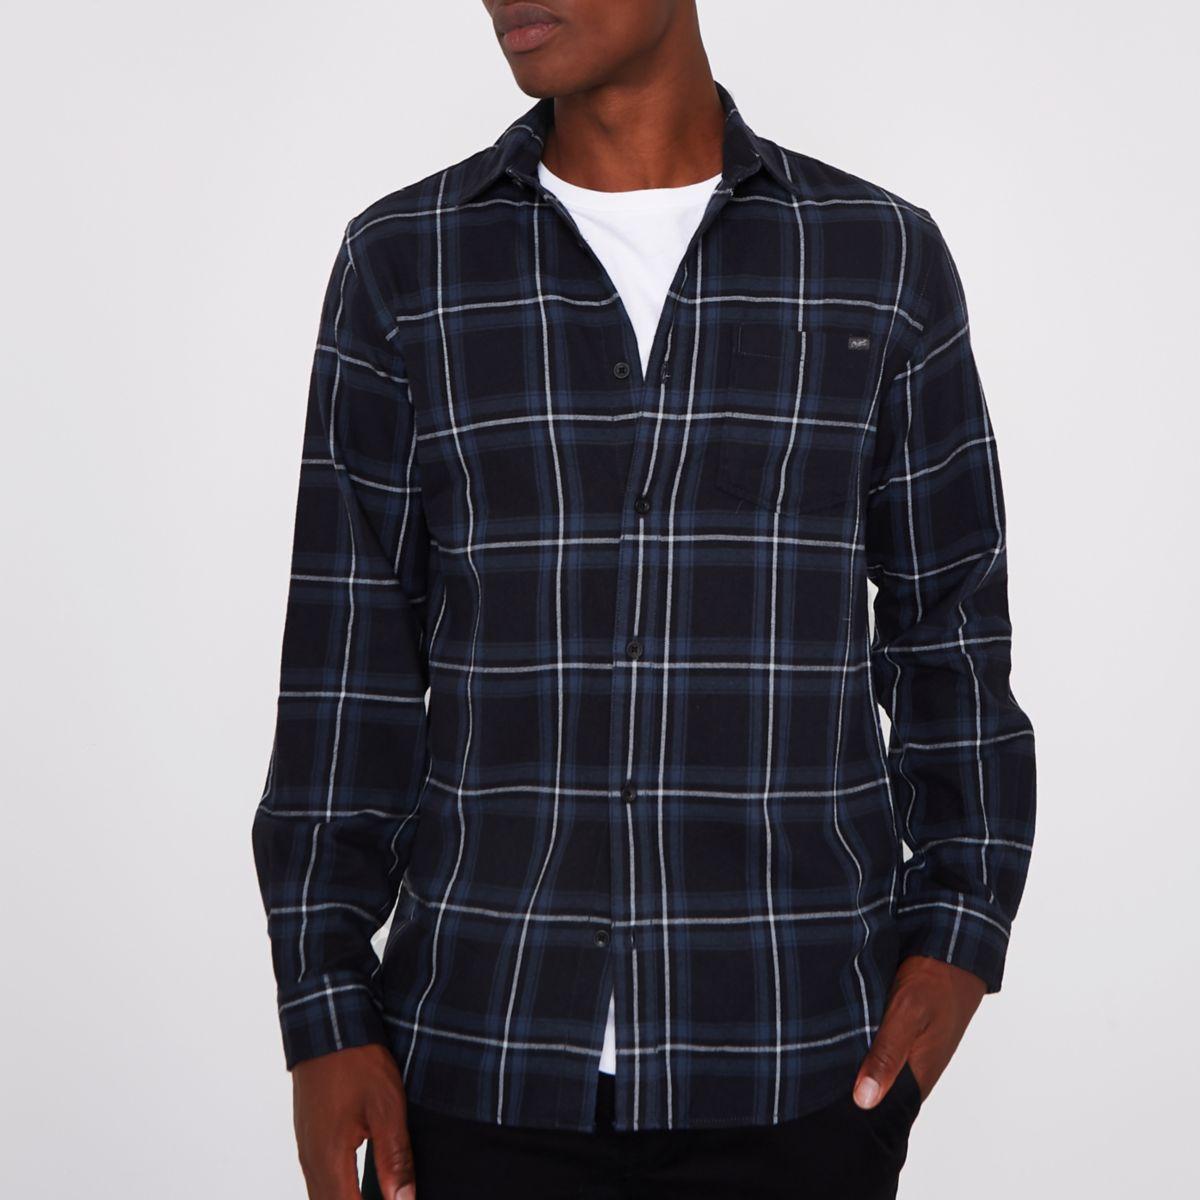 Jack & Jones black check shirt